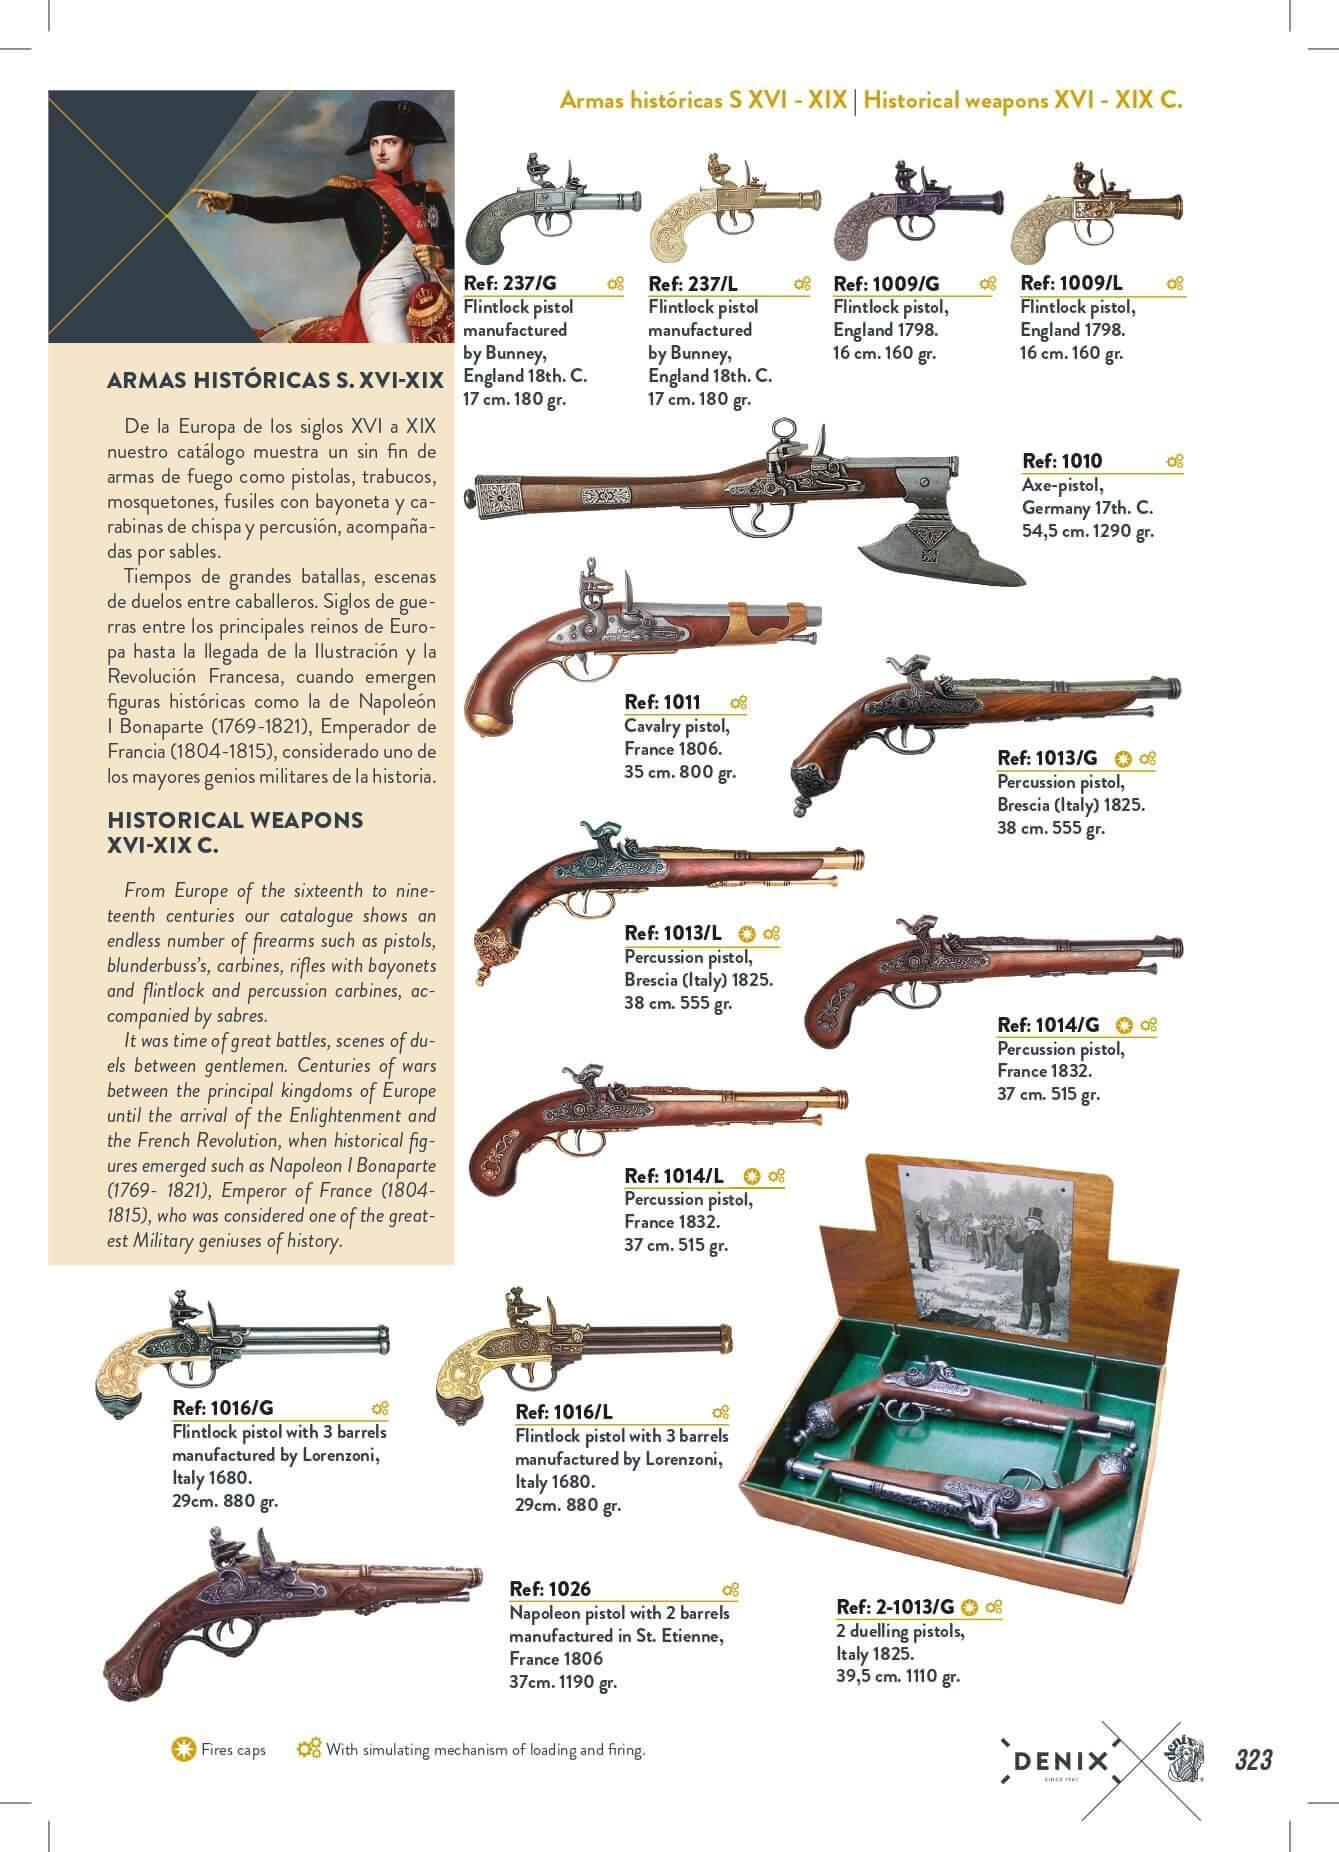 HISTORICAL GUNS S  XVI-XIX 🔪 Denix - arms antique replicas